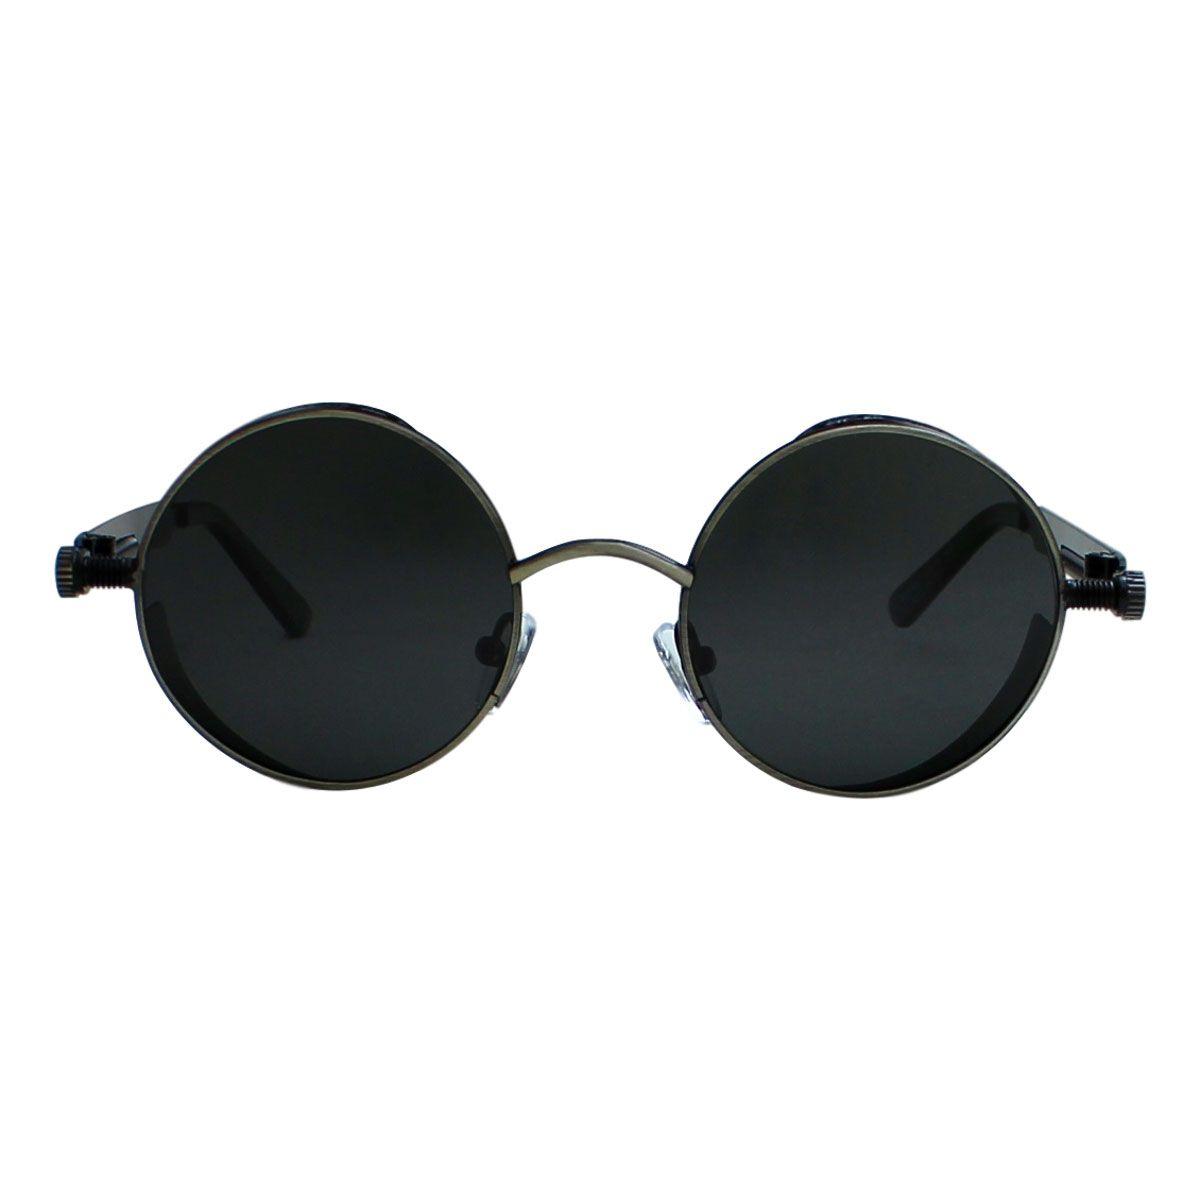 Óculos de Sol Díspar D2229 Redondo Chumbo